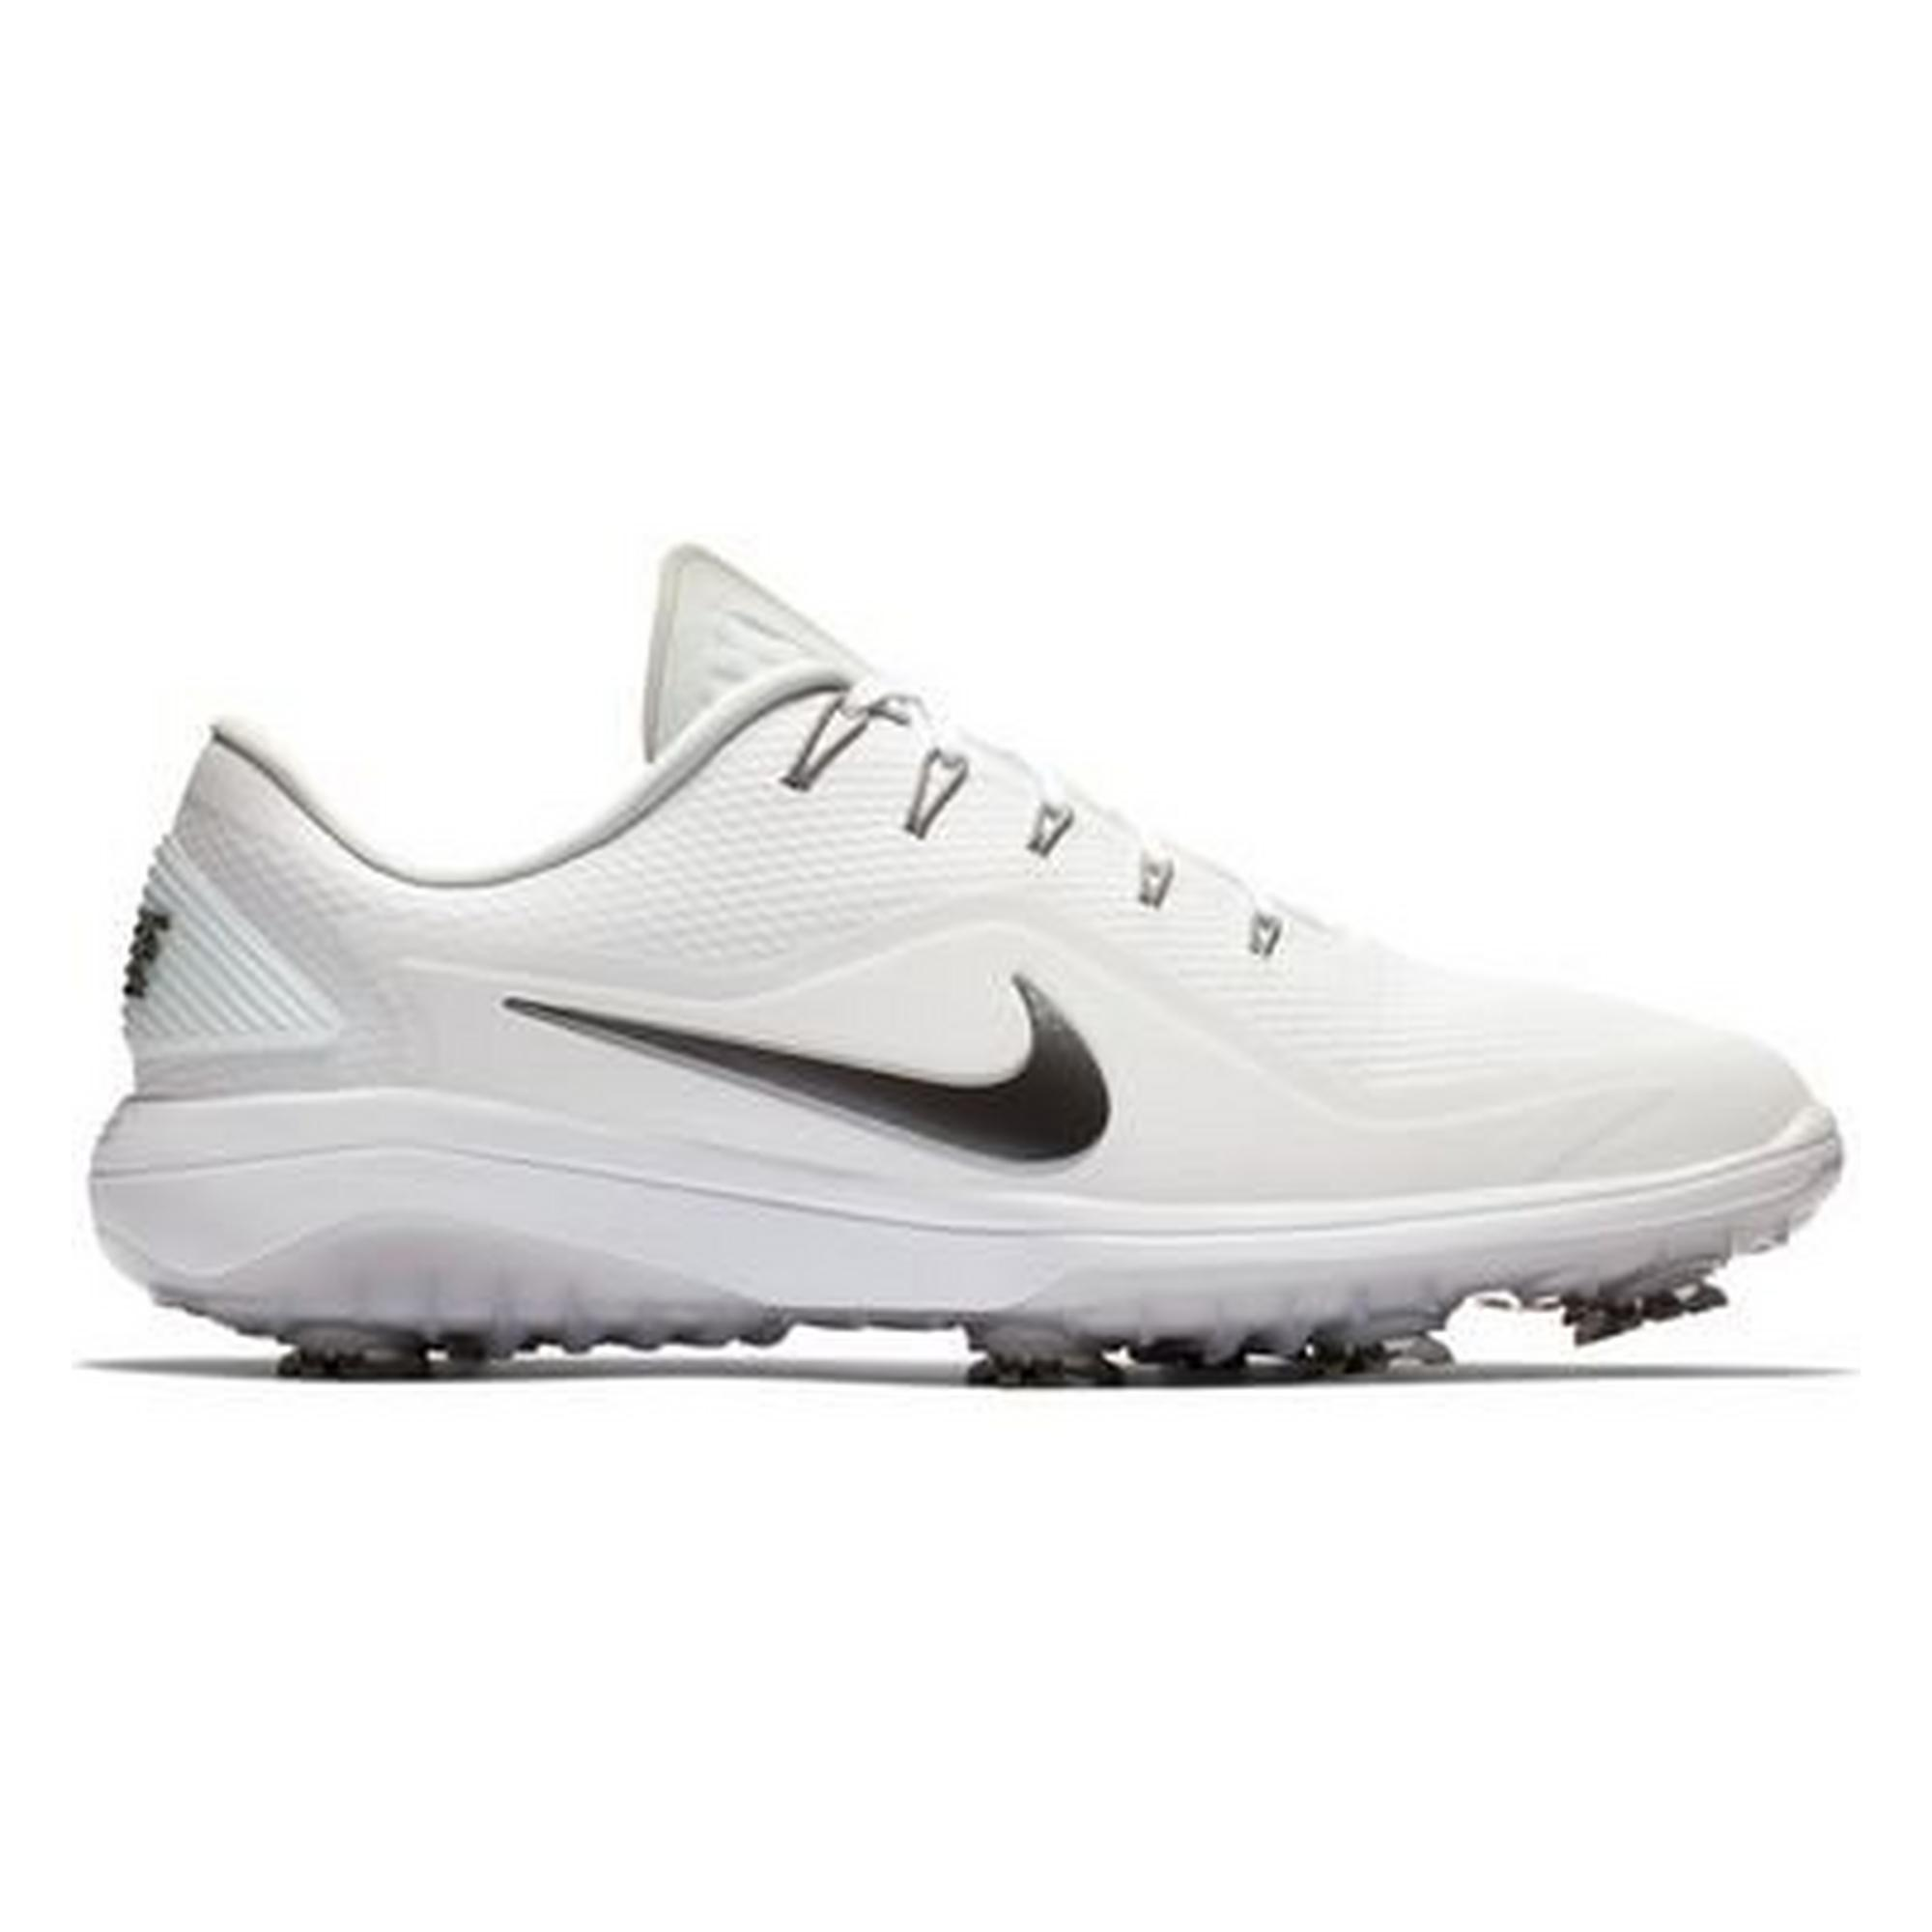 Men's React Vapor 2 Spiked Golf Shoe - WHITE/SILVER